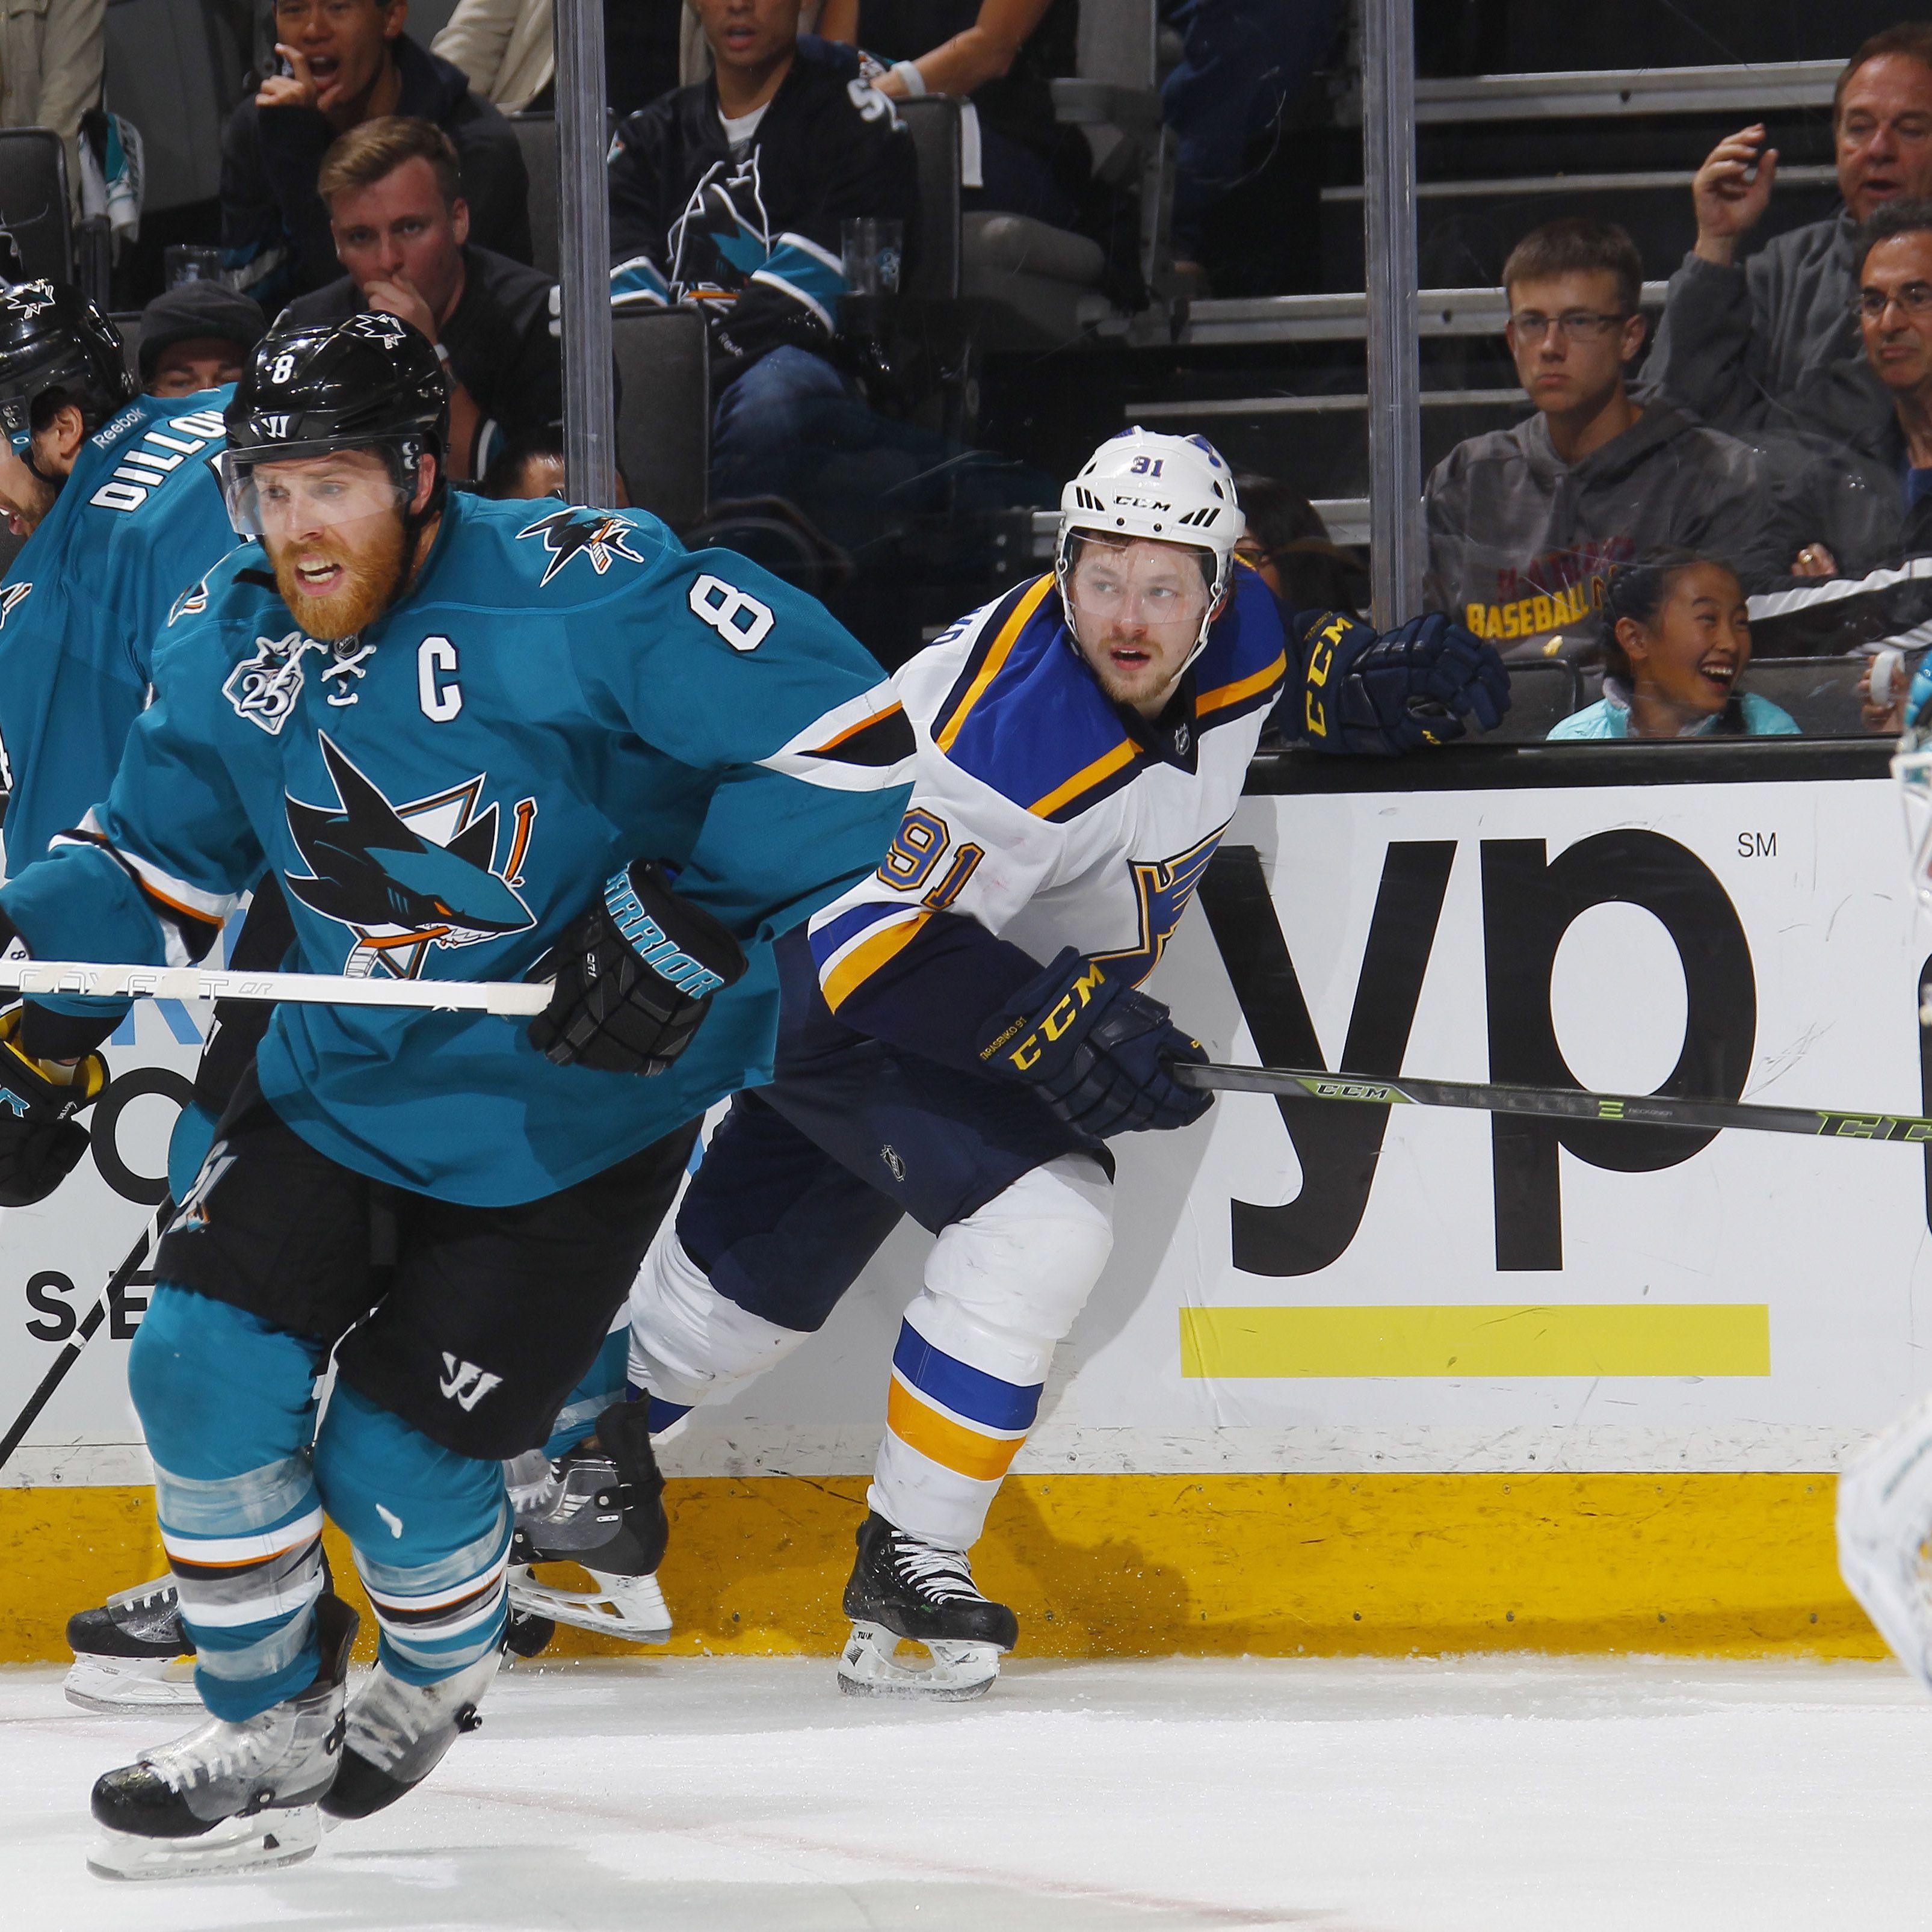 cheaper 21a3e 506b0 San Jose Sharks Hockey & The SAP Center